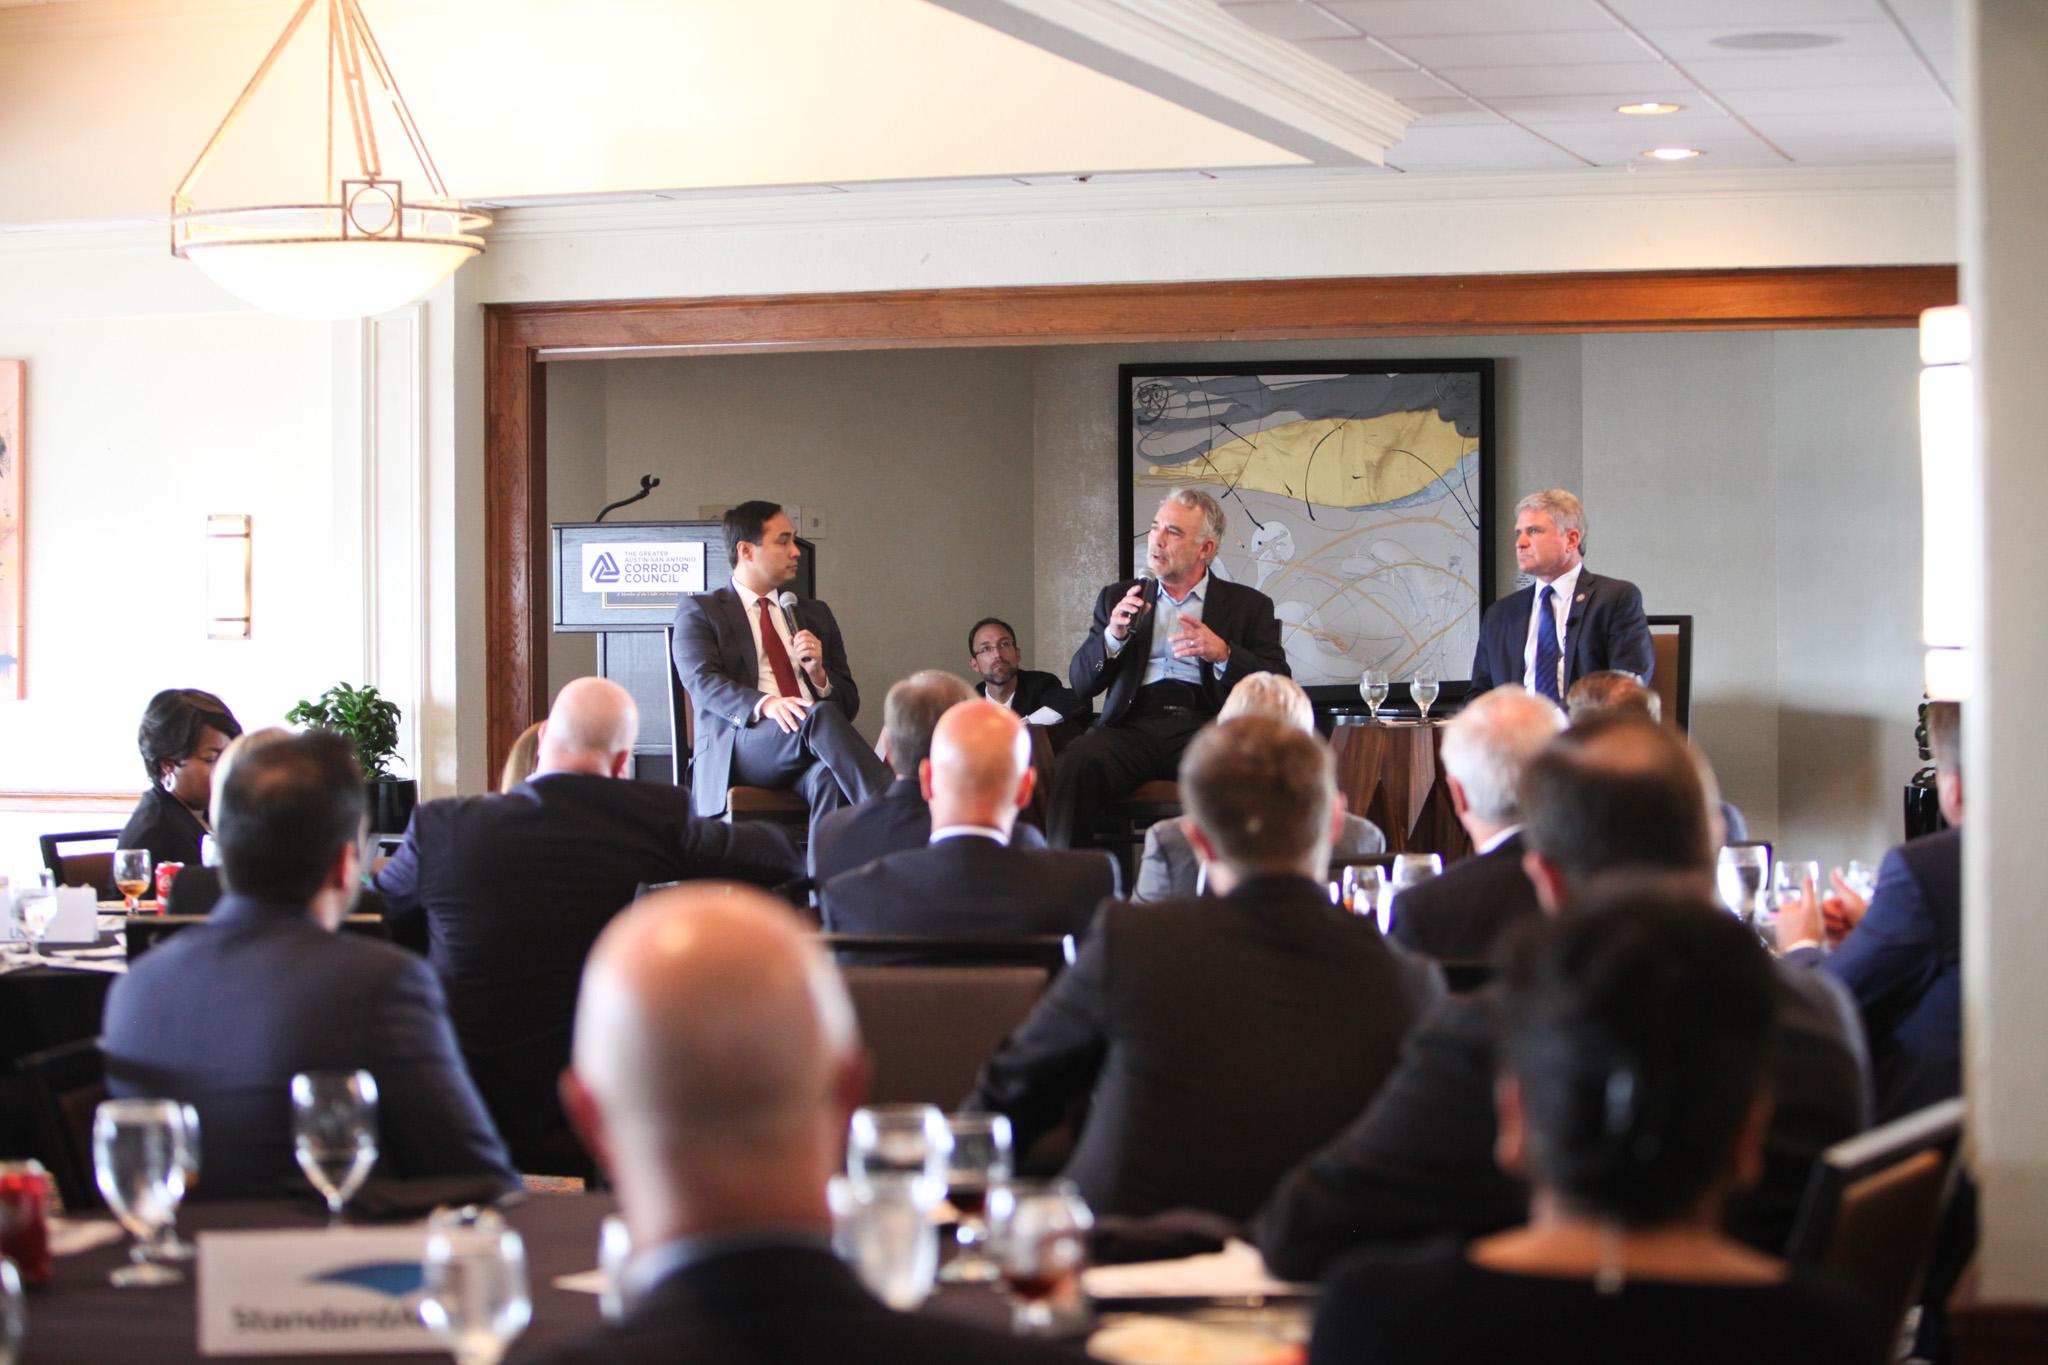 (From left to right) Congressmen Joaquín Castro (D-Texas), moderator Robert Rivard, and Congressman Michael McCaul (R-Texas) discuss issues os Washington at a bipartisan panel.